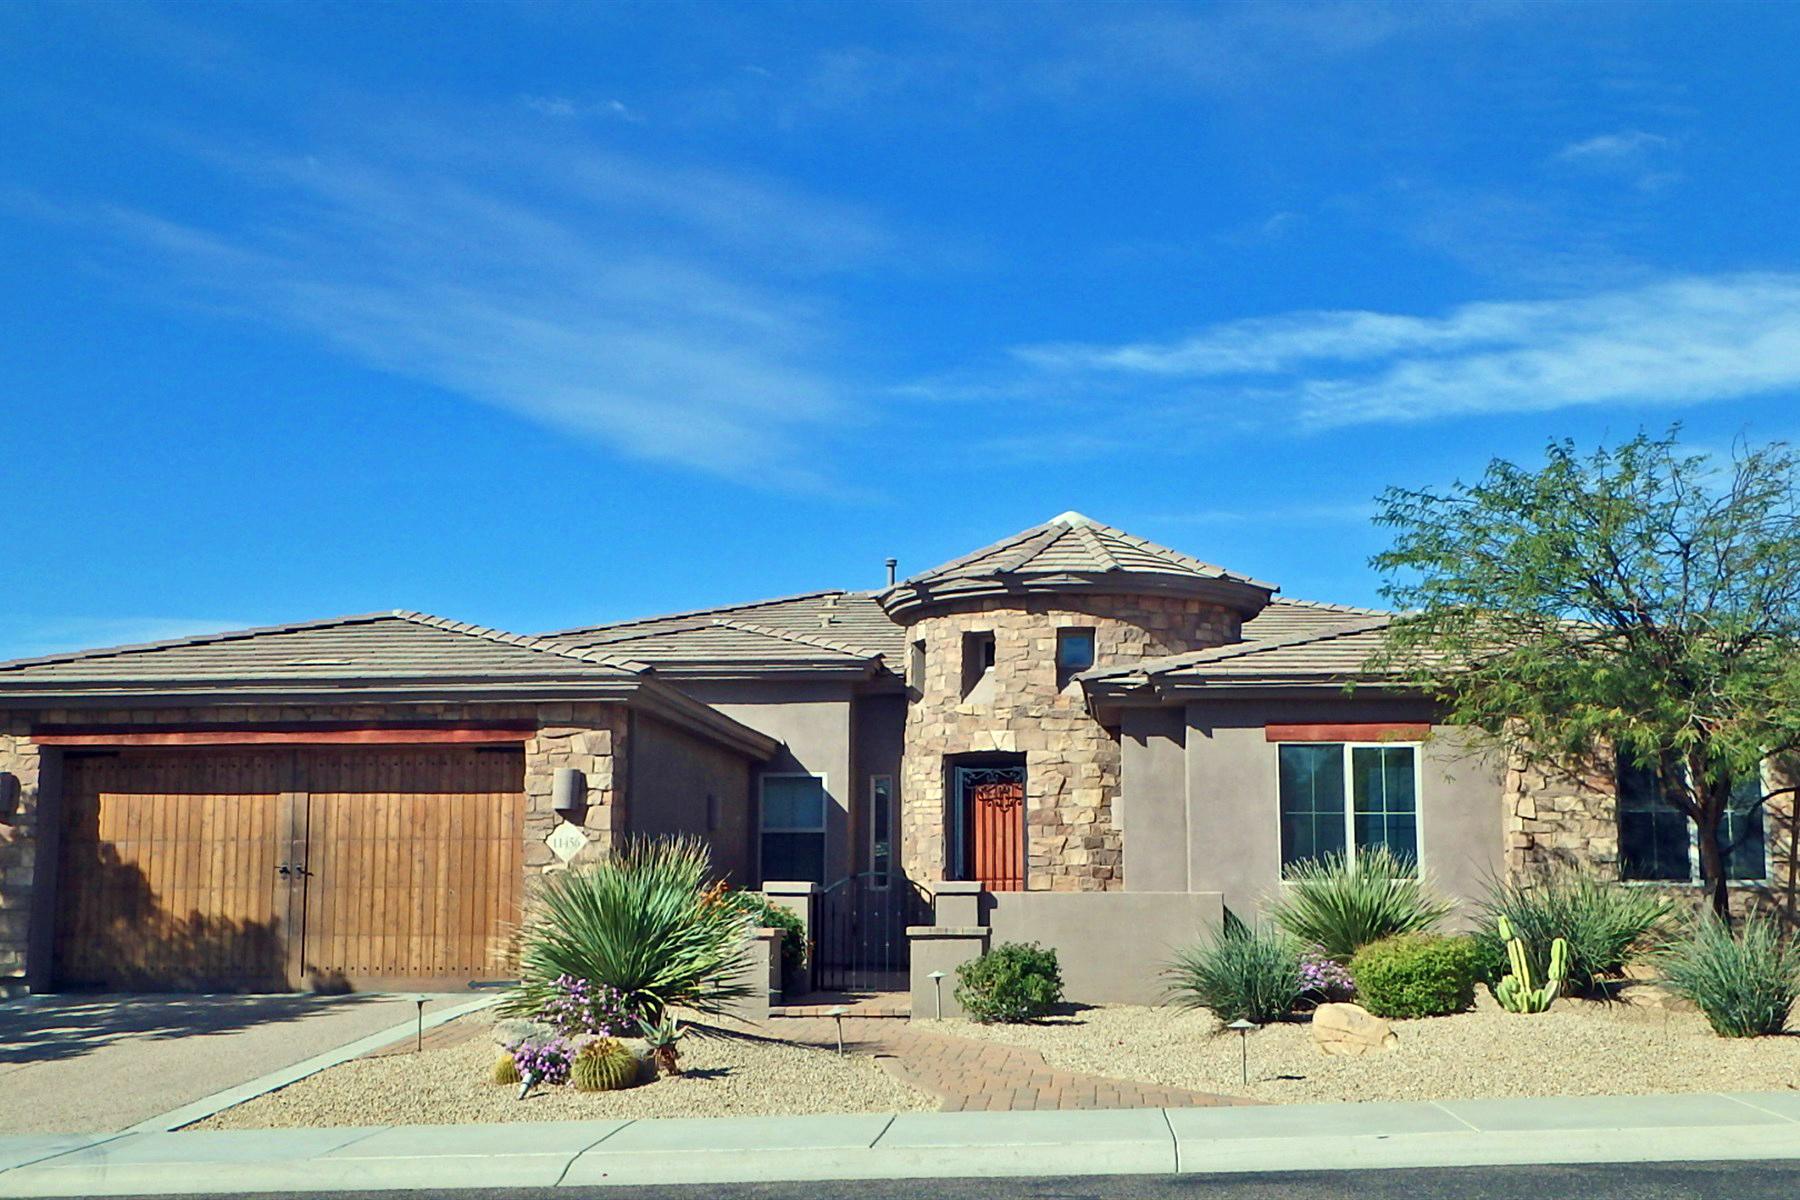 Casa Unifamiliar por un Venta en Pristine Luxury Estate Home in Fabulous Gated Scottsdale Community 11456 N 124th Way Scottsdale, Arizona 85259 Estados Unidos